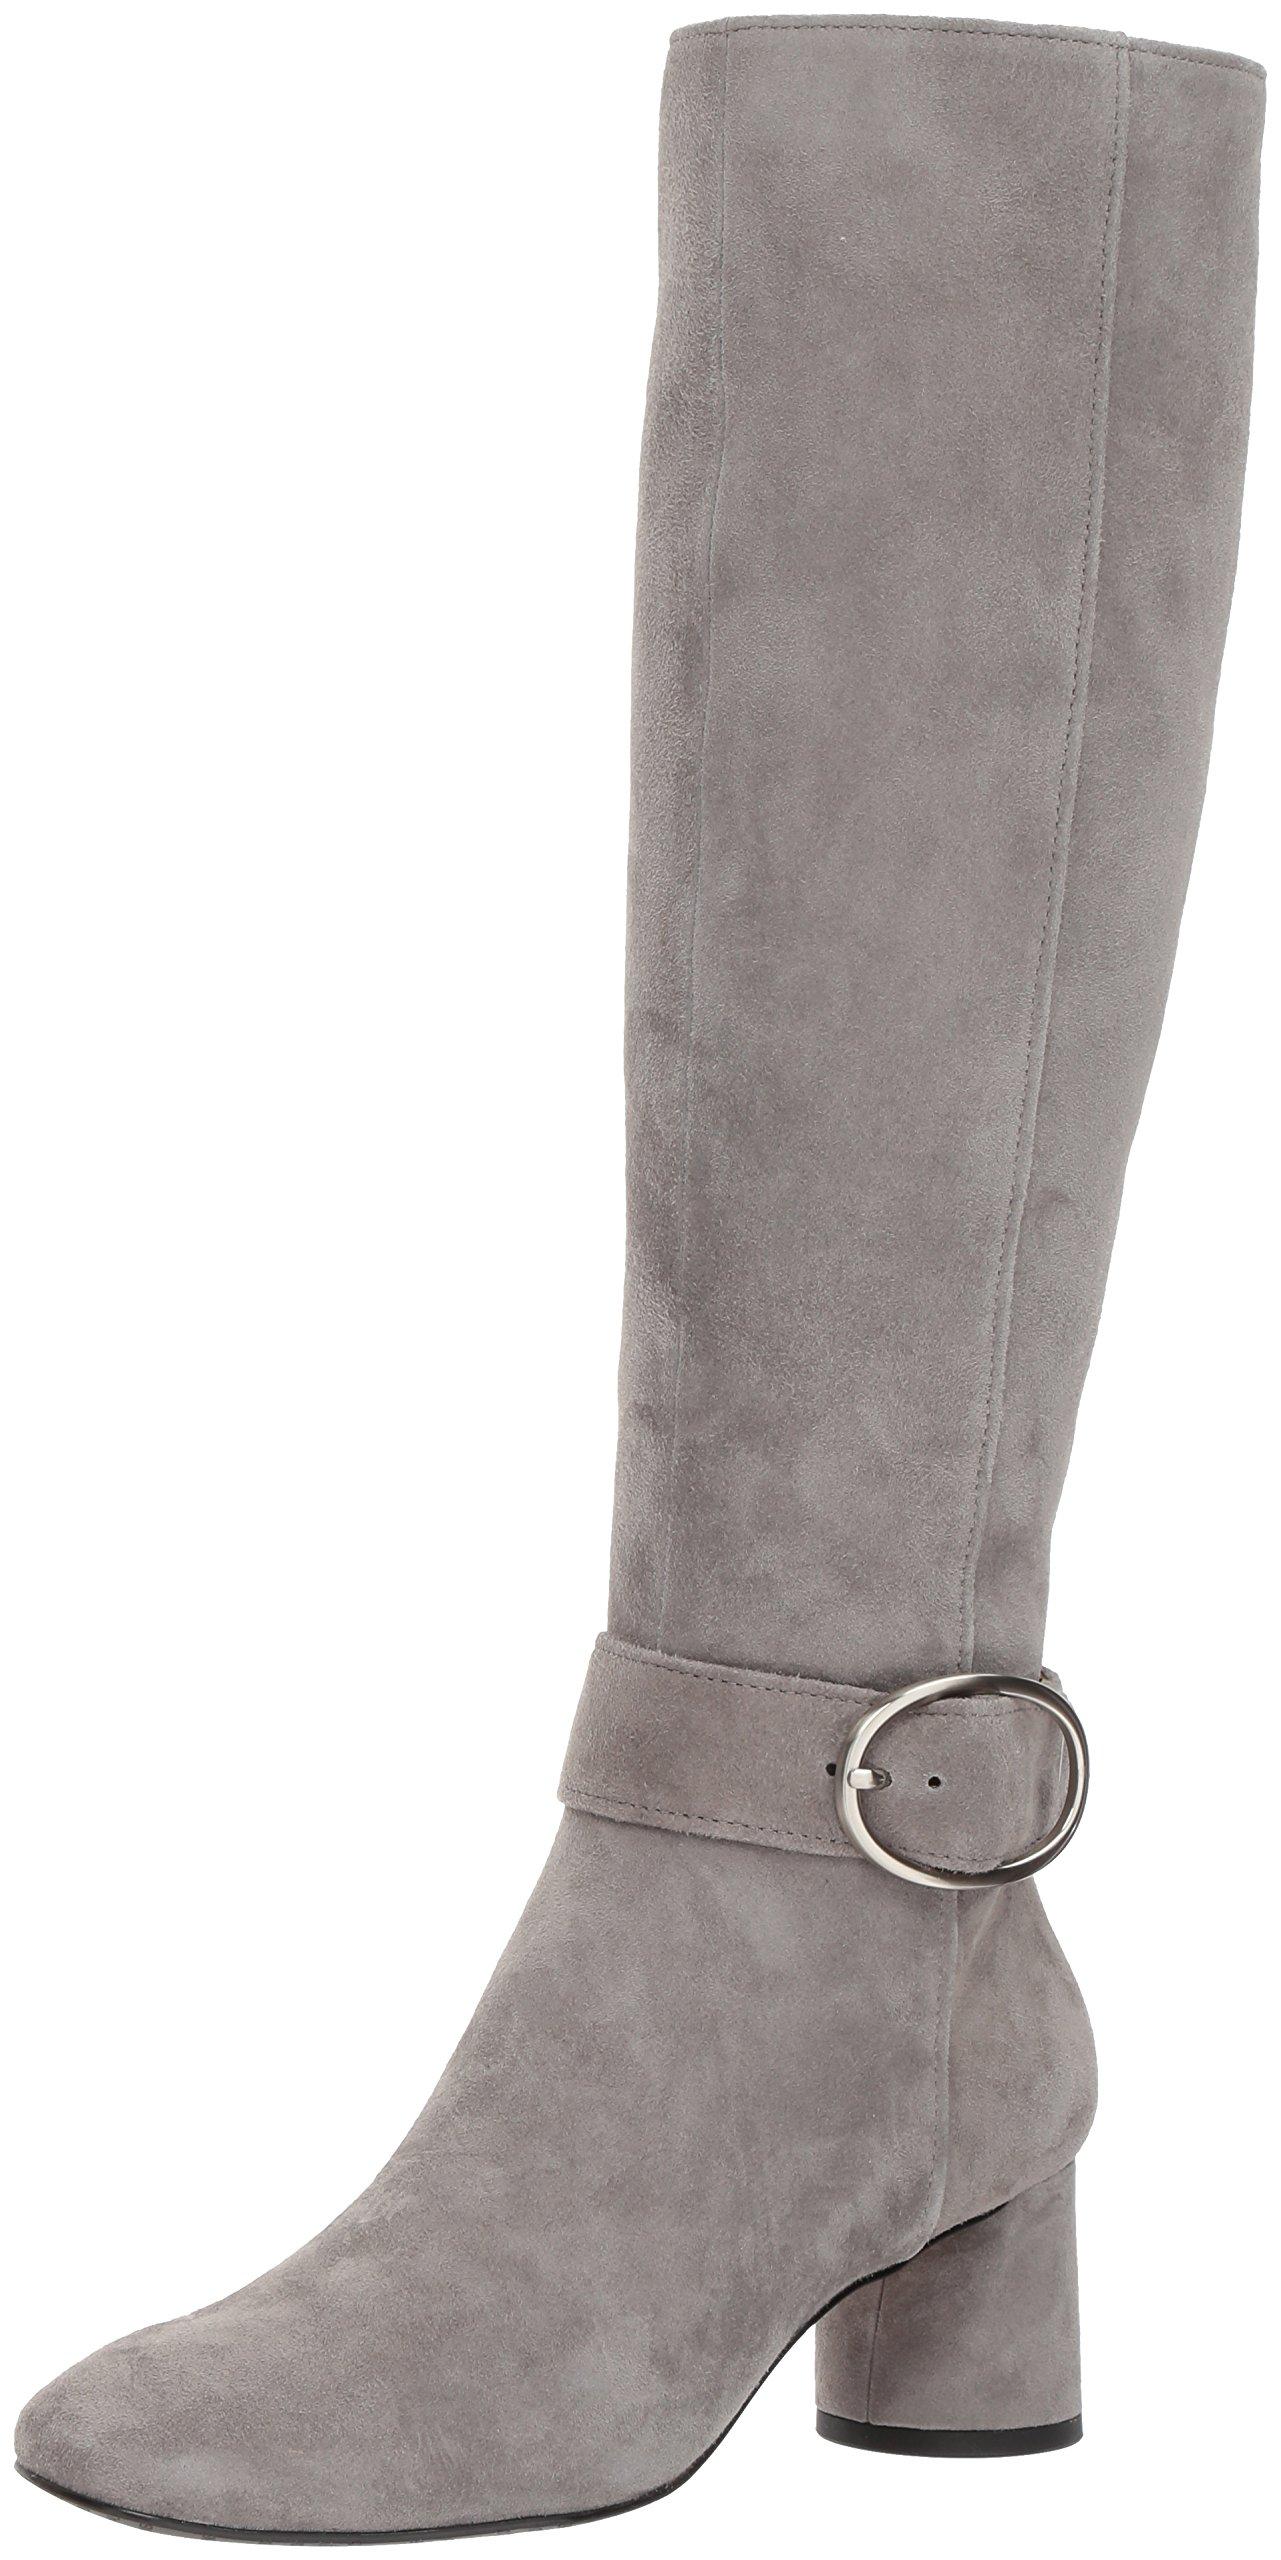 Donald J Pliner Women's Caye Fashion Boot, Carbon, 8 M US